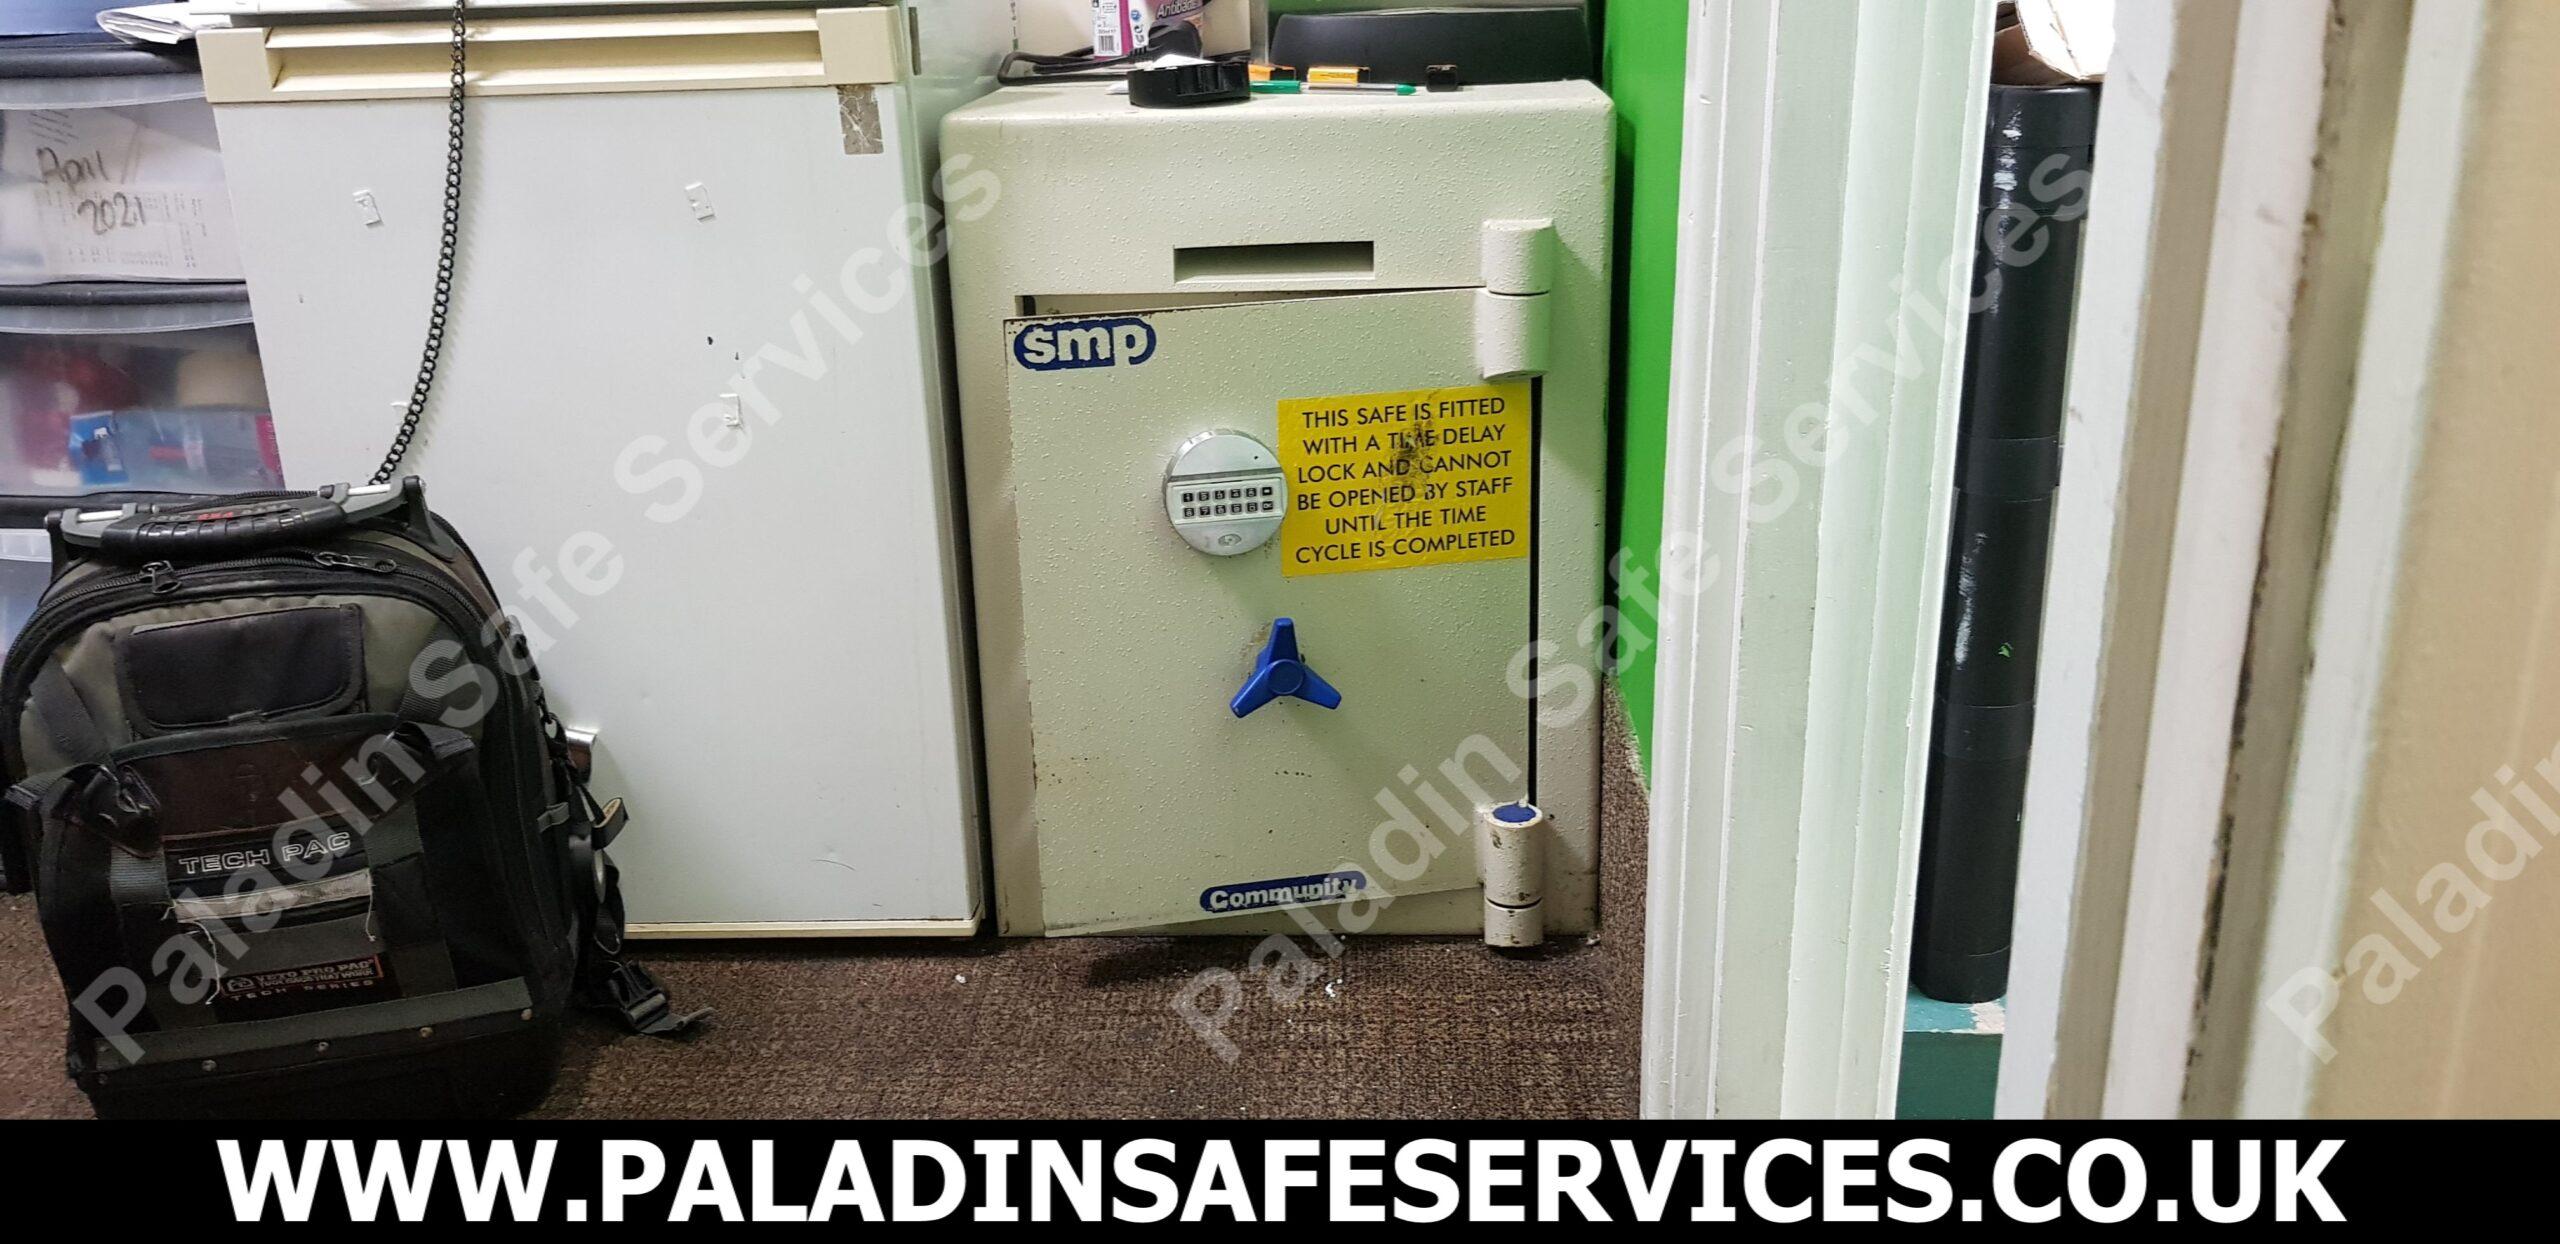 SMP Community Safe Failed Combination Lock Liverpool